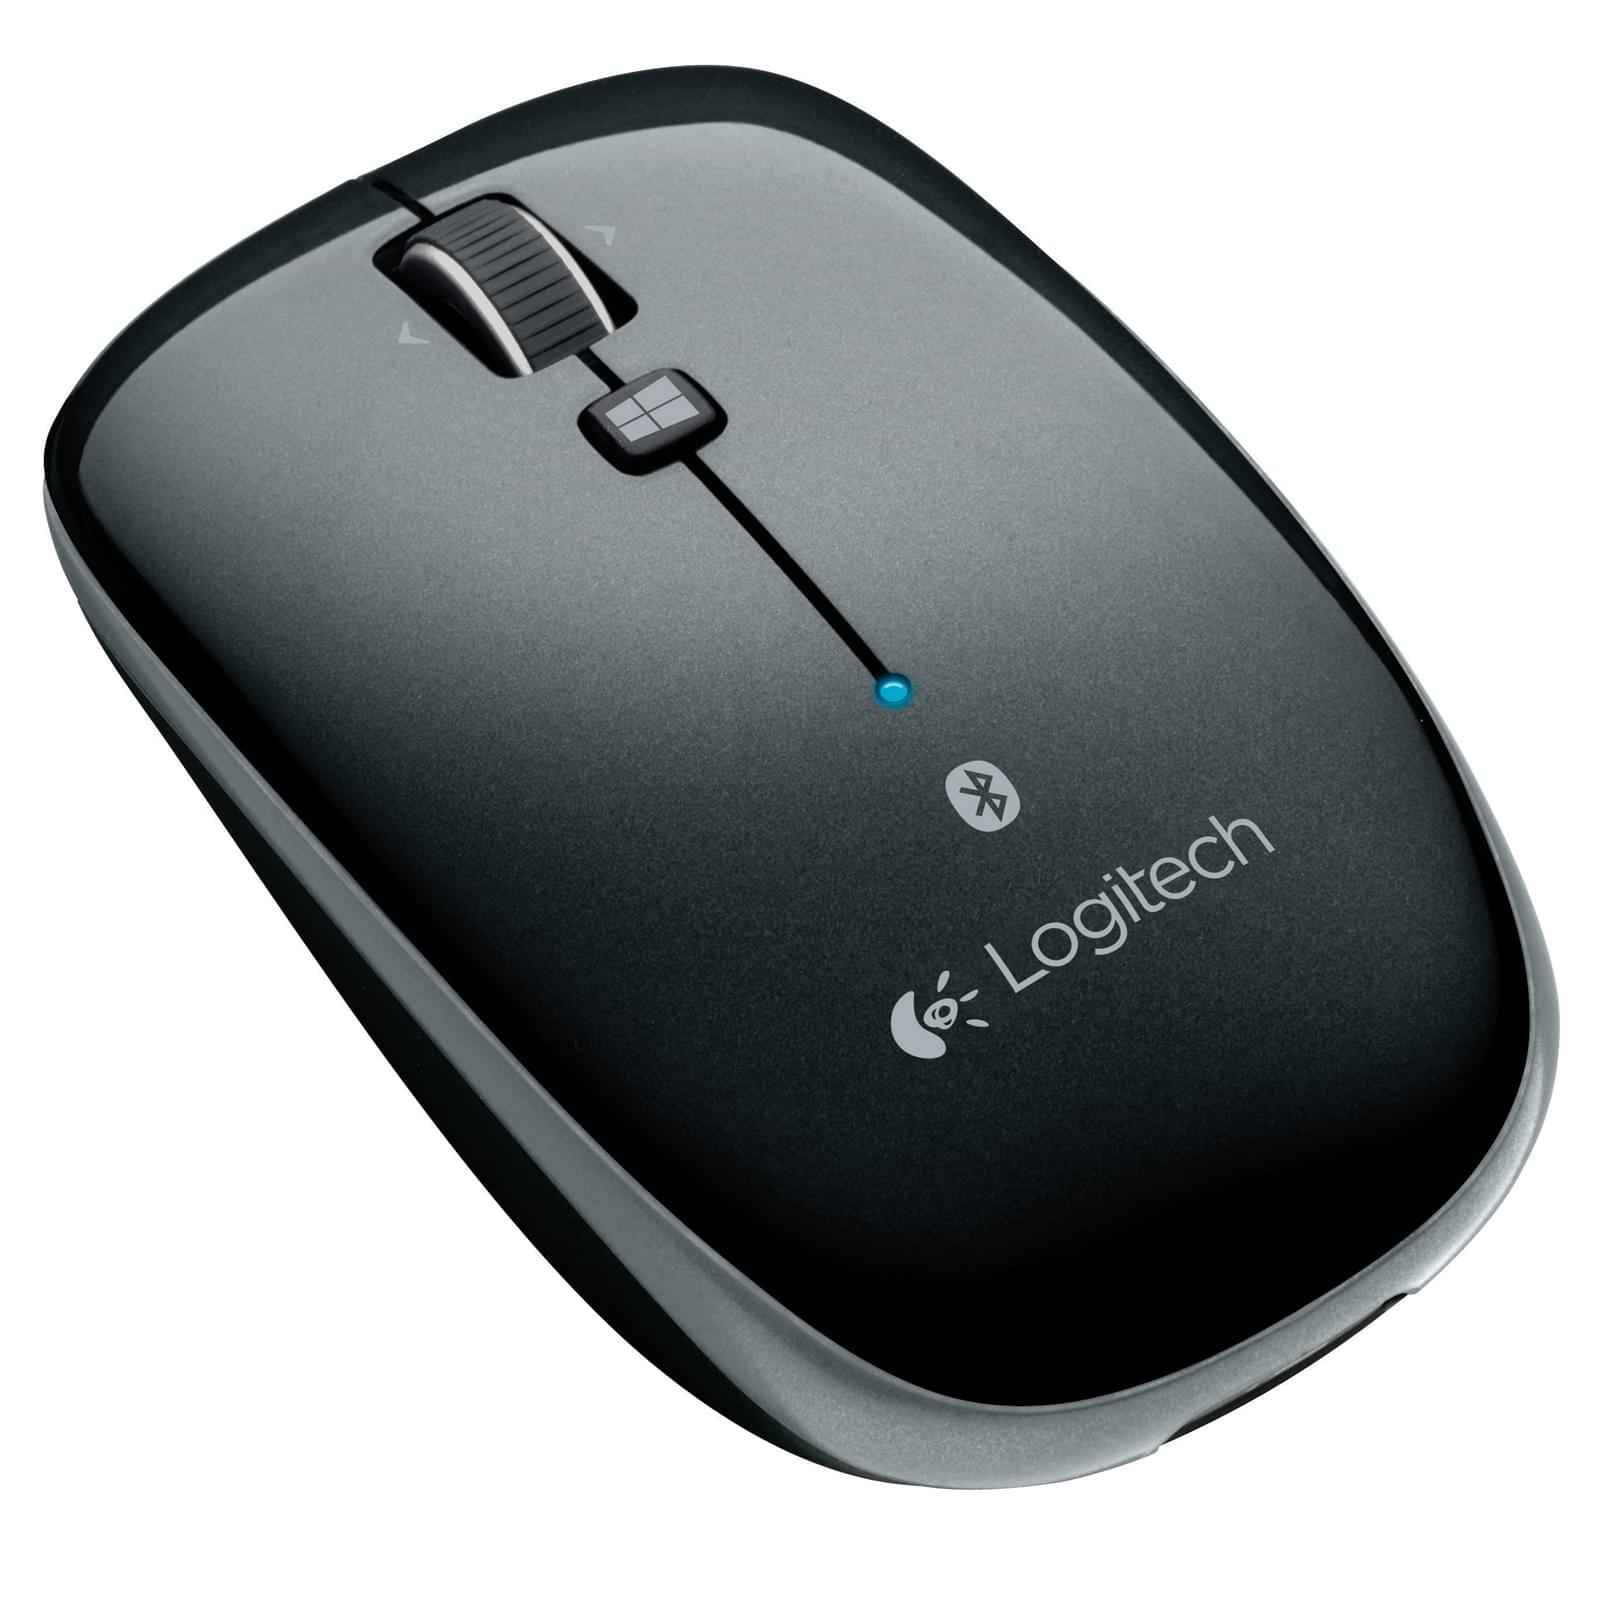 Logitech Bluetooth Mouse M557 - Souris PC Logitech - Cybertek.fr - 0